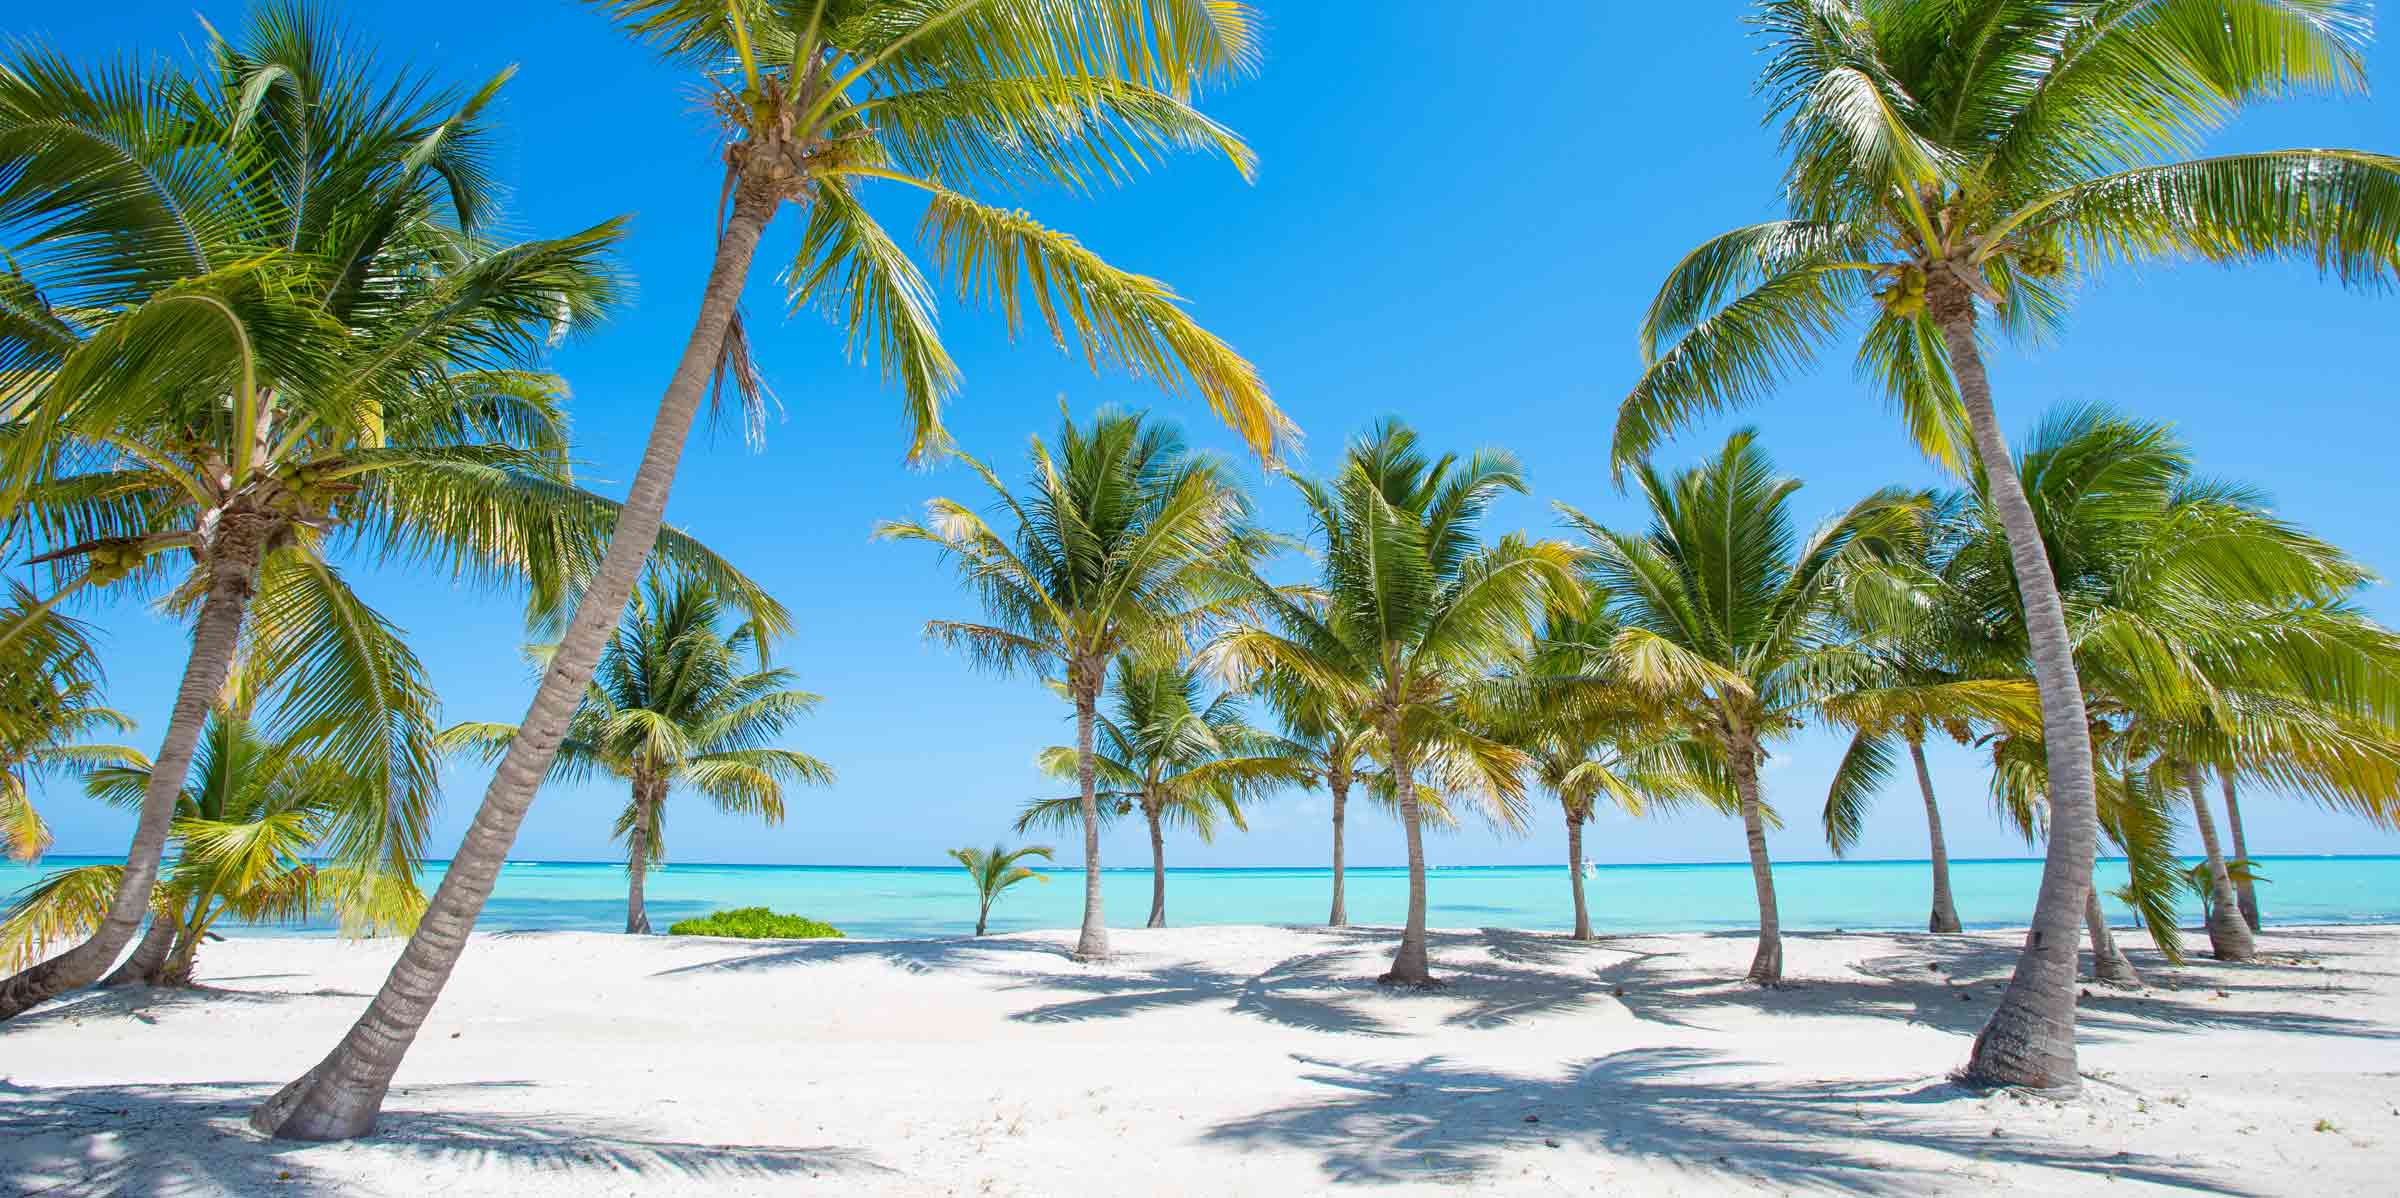 The Dominican Republic. Punta Cana or Boca Chica